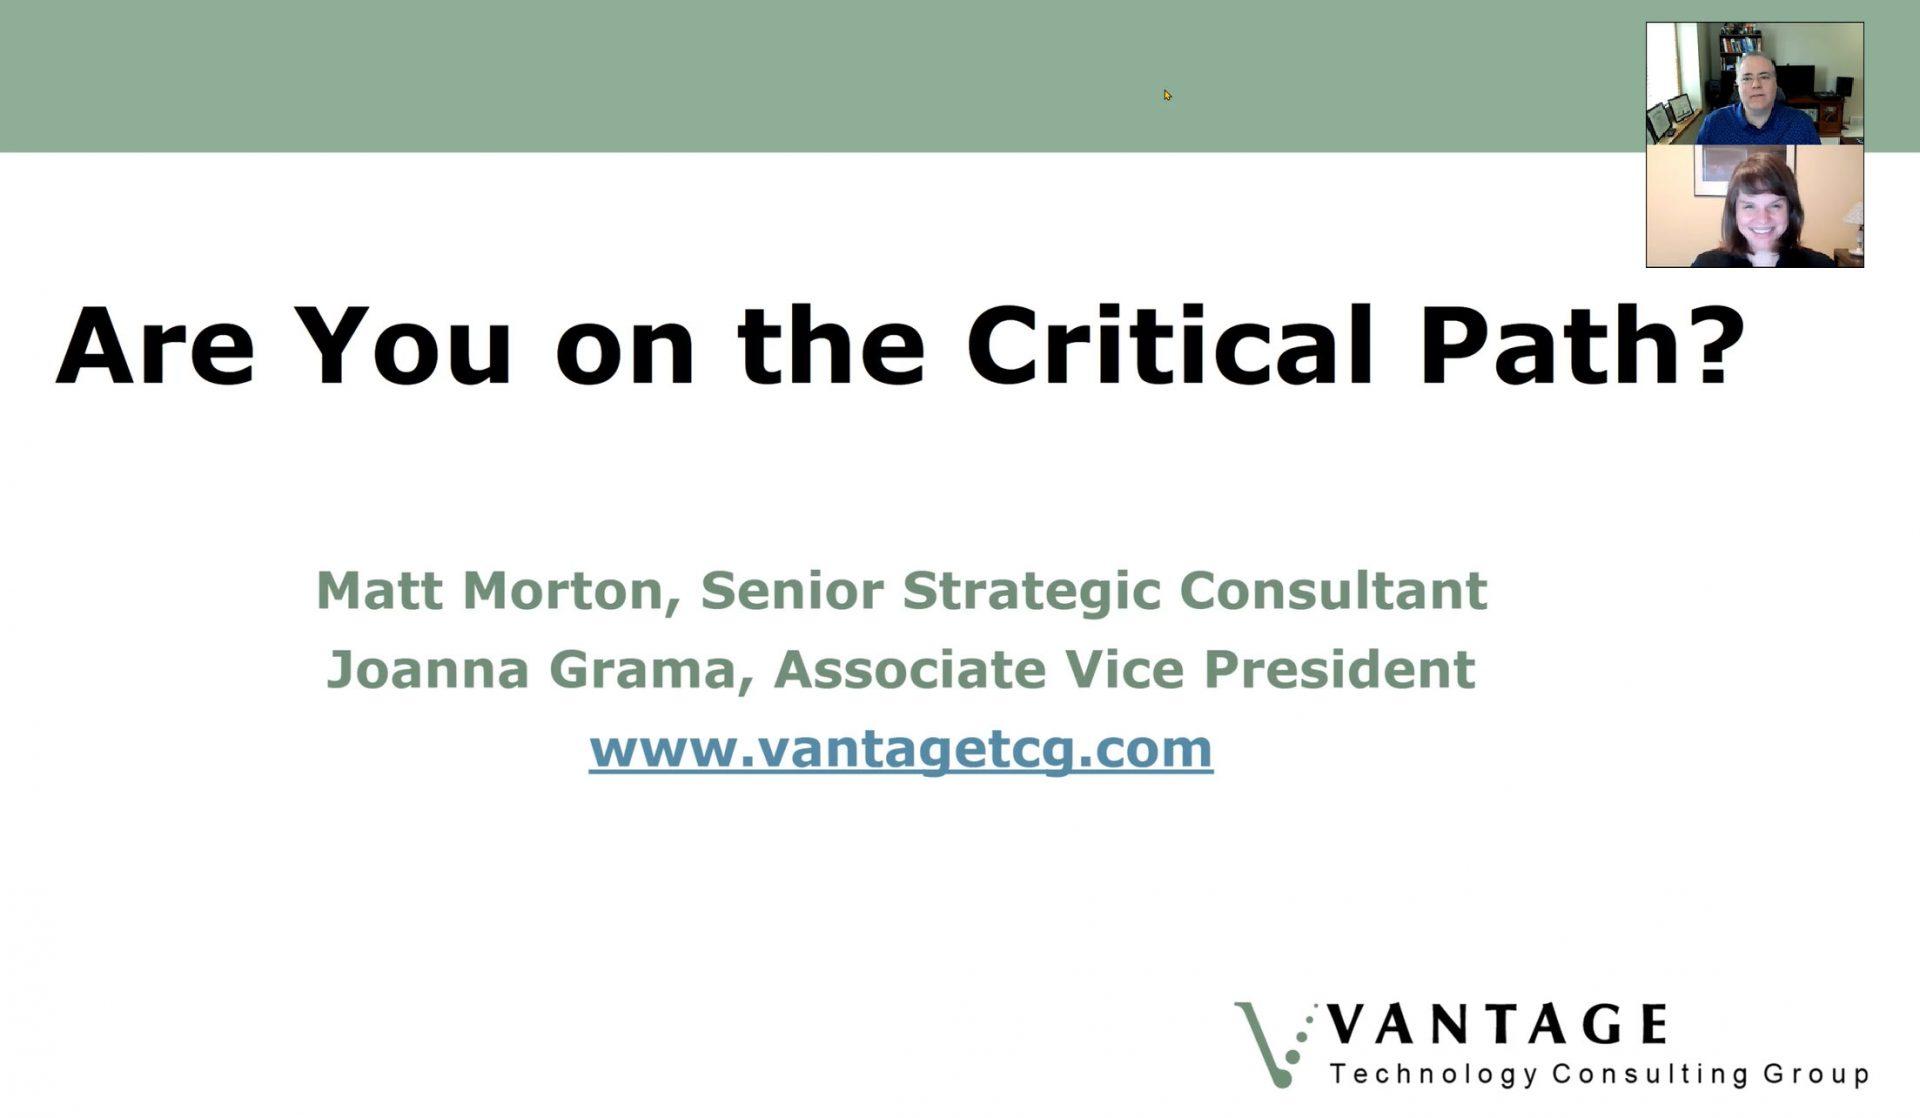 Are You on the Critical Path? Matt Morton, Senior Strategic Consultant. Joanna Grama, Associate Vice President. www.vantagetcg.com